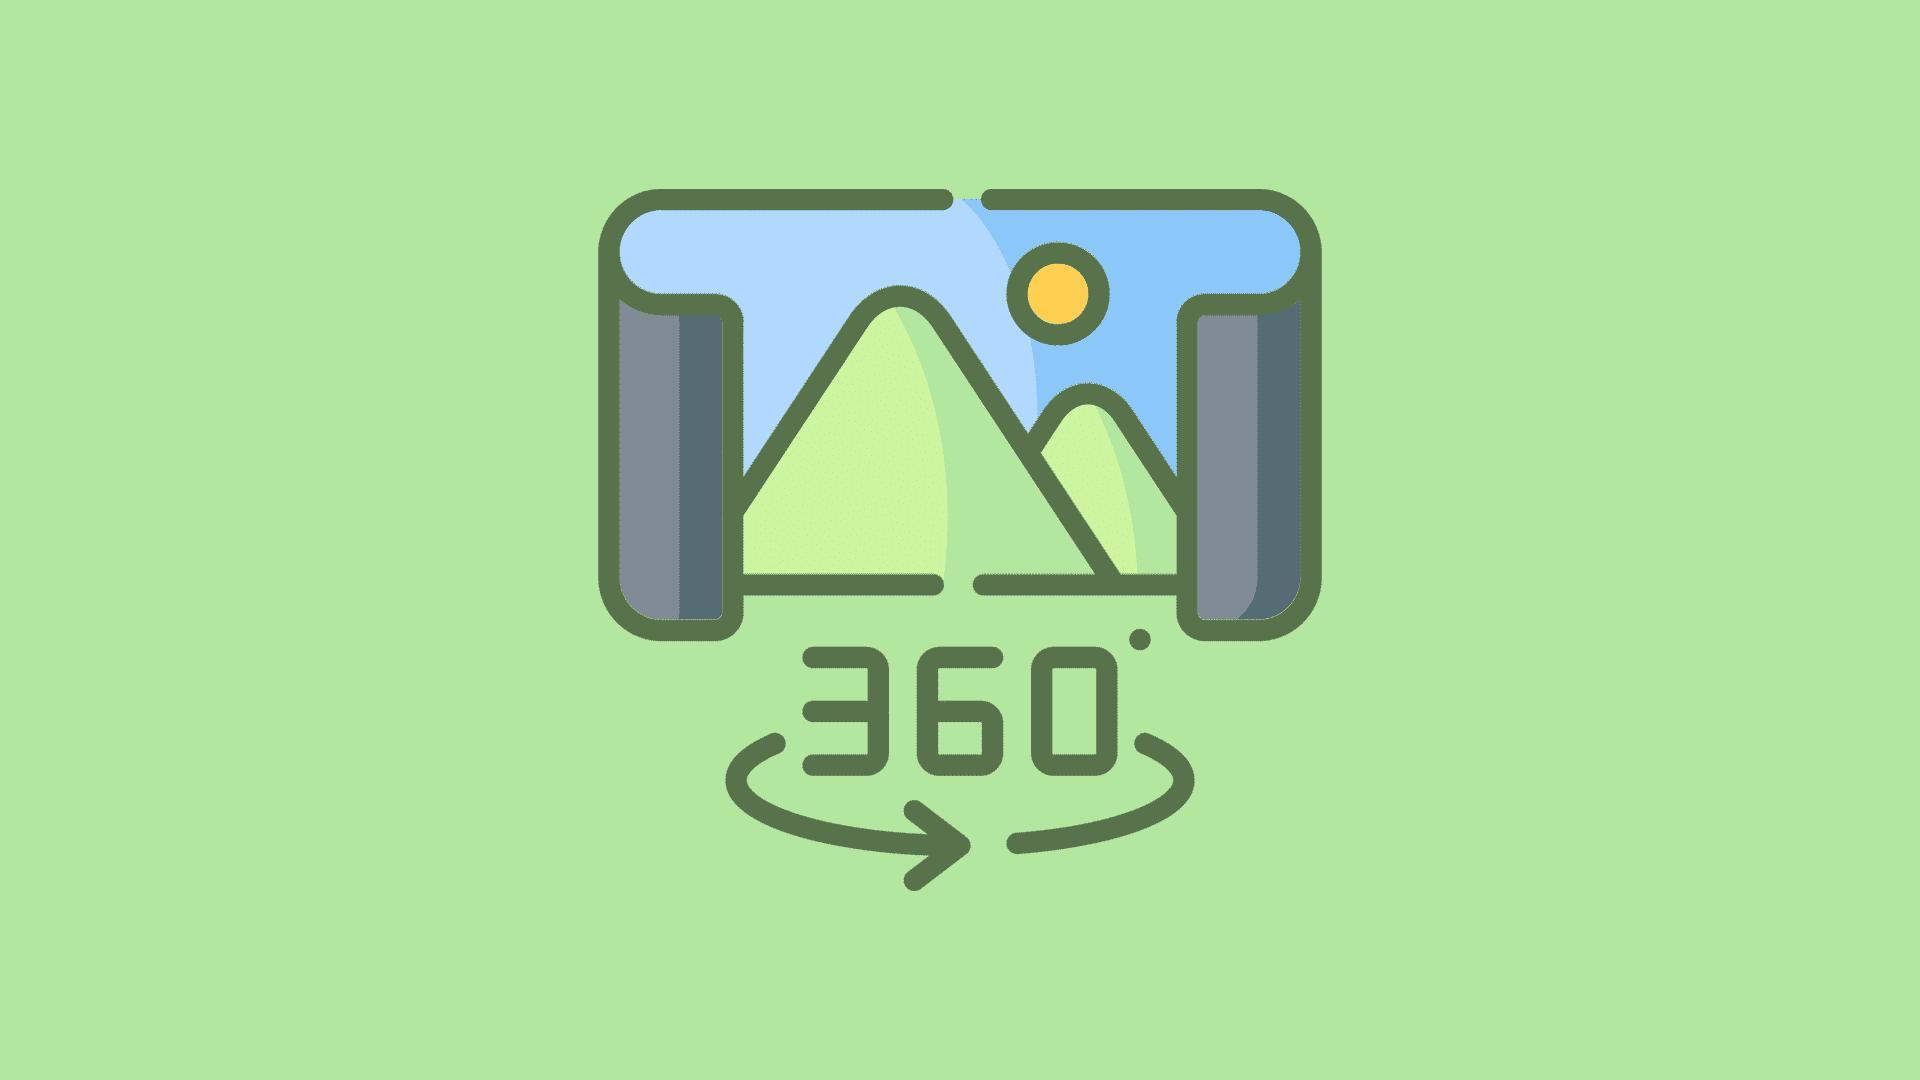 Como funcionam as fotos 360 para negocios